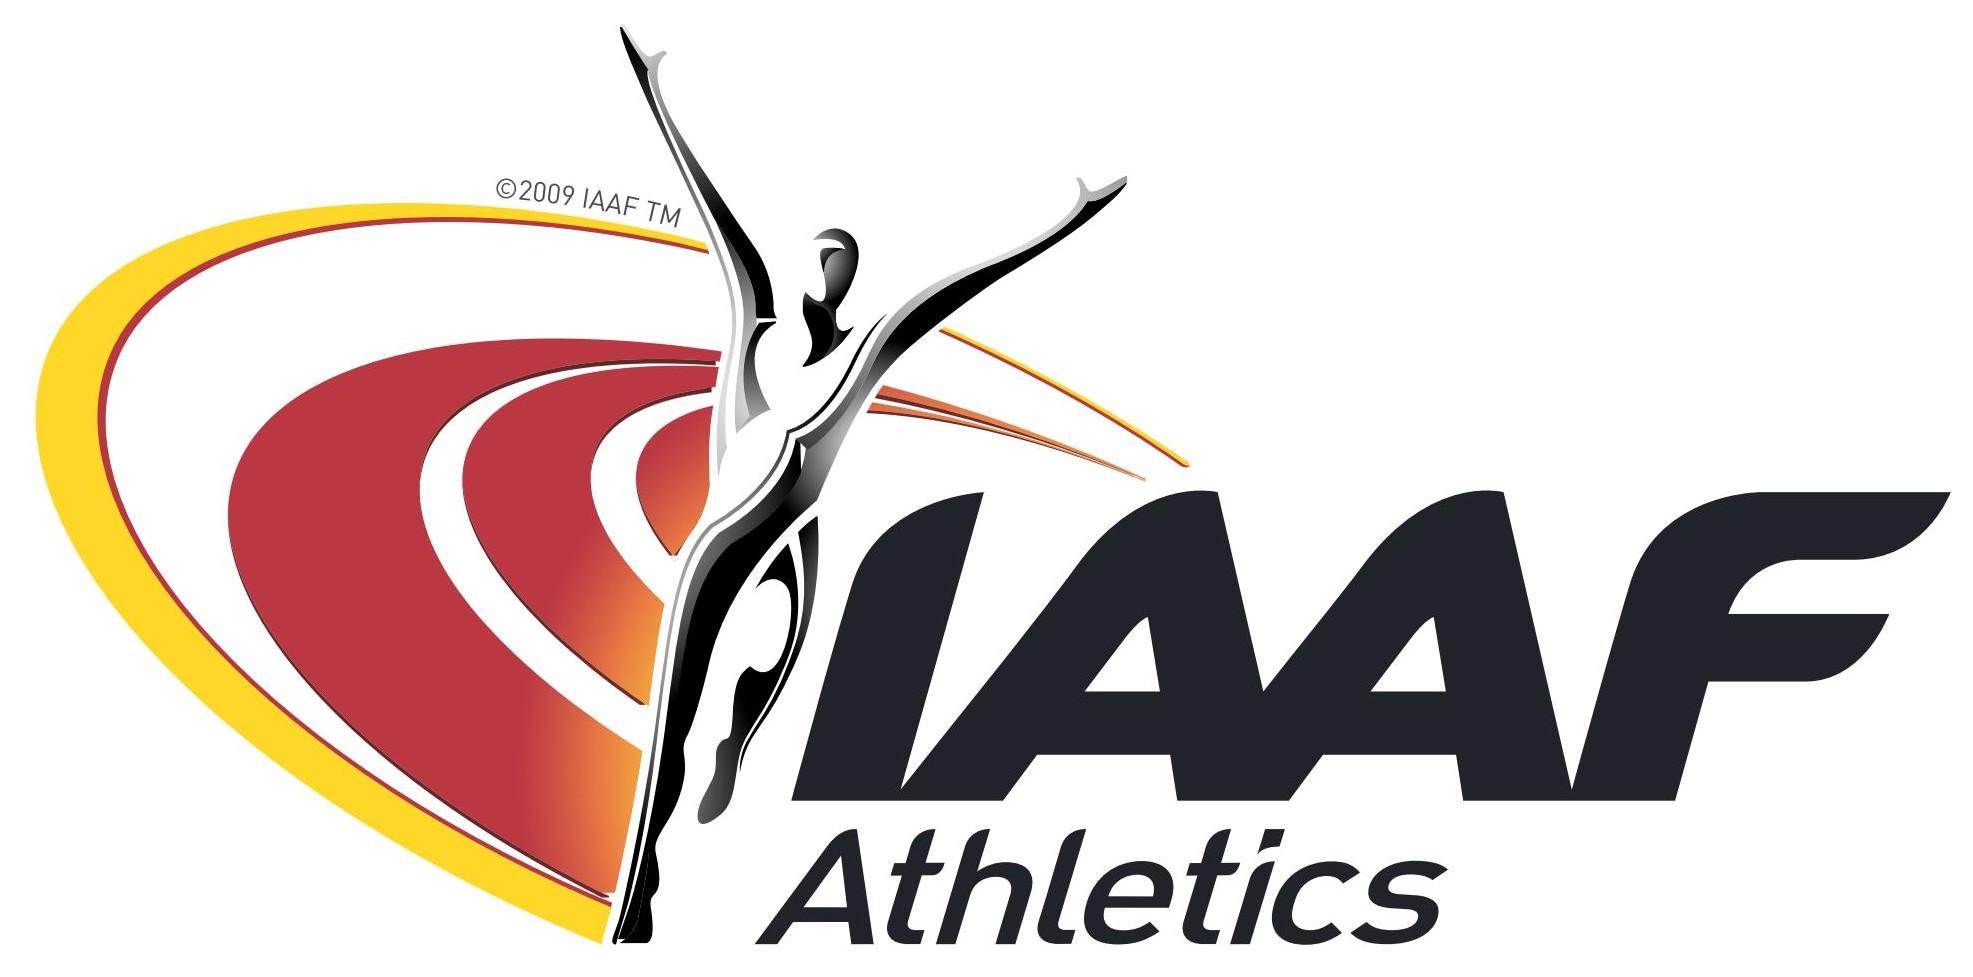 International-Association-of-Athletics-Federations-IAAF-logo.jpg